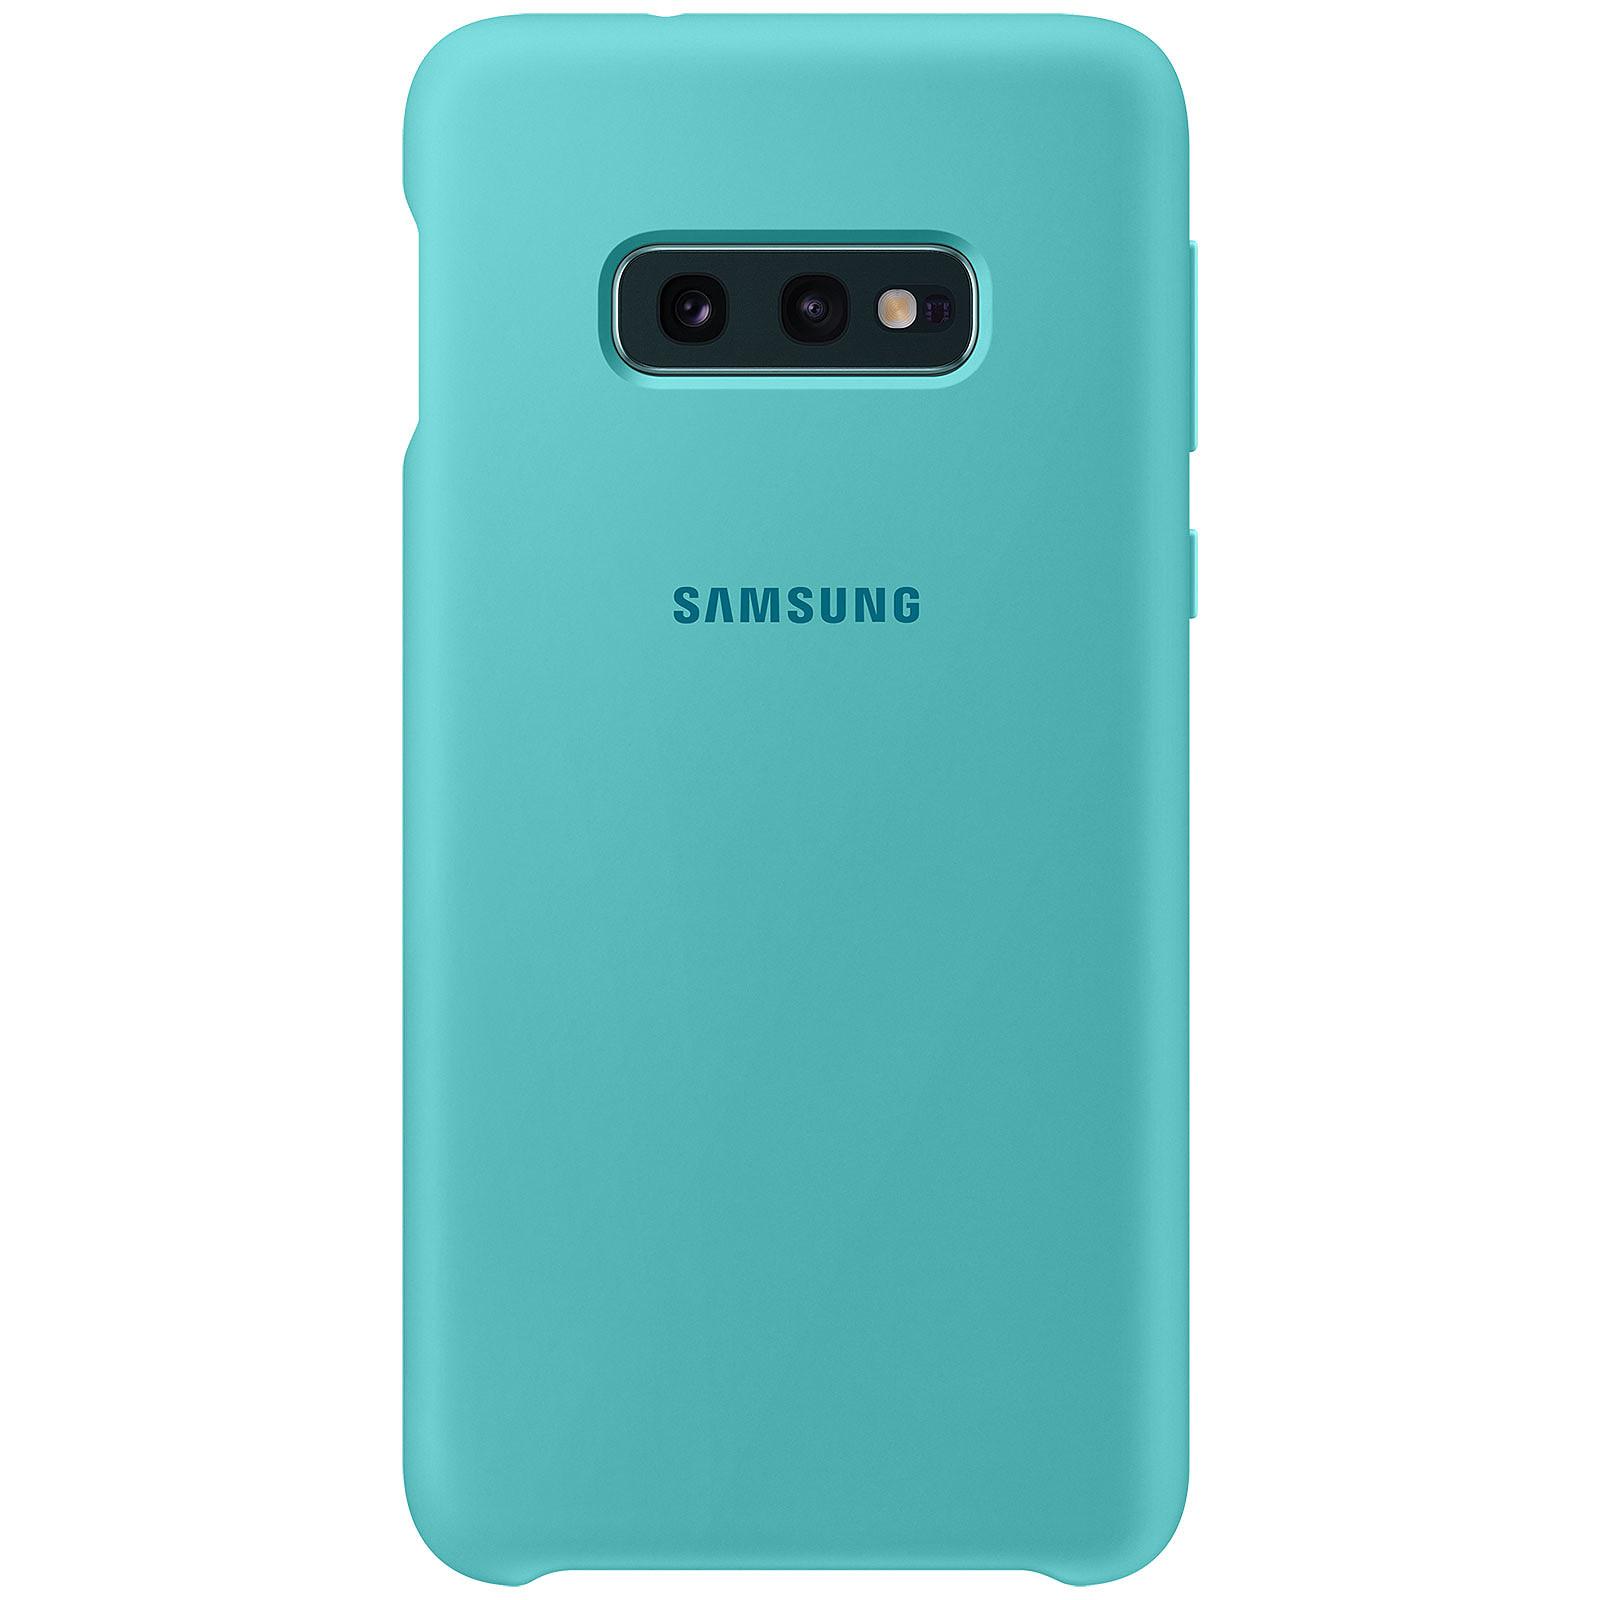 various design 50% off low price Samsung Coque Silicone Vert Galaxy S10e